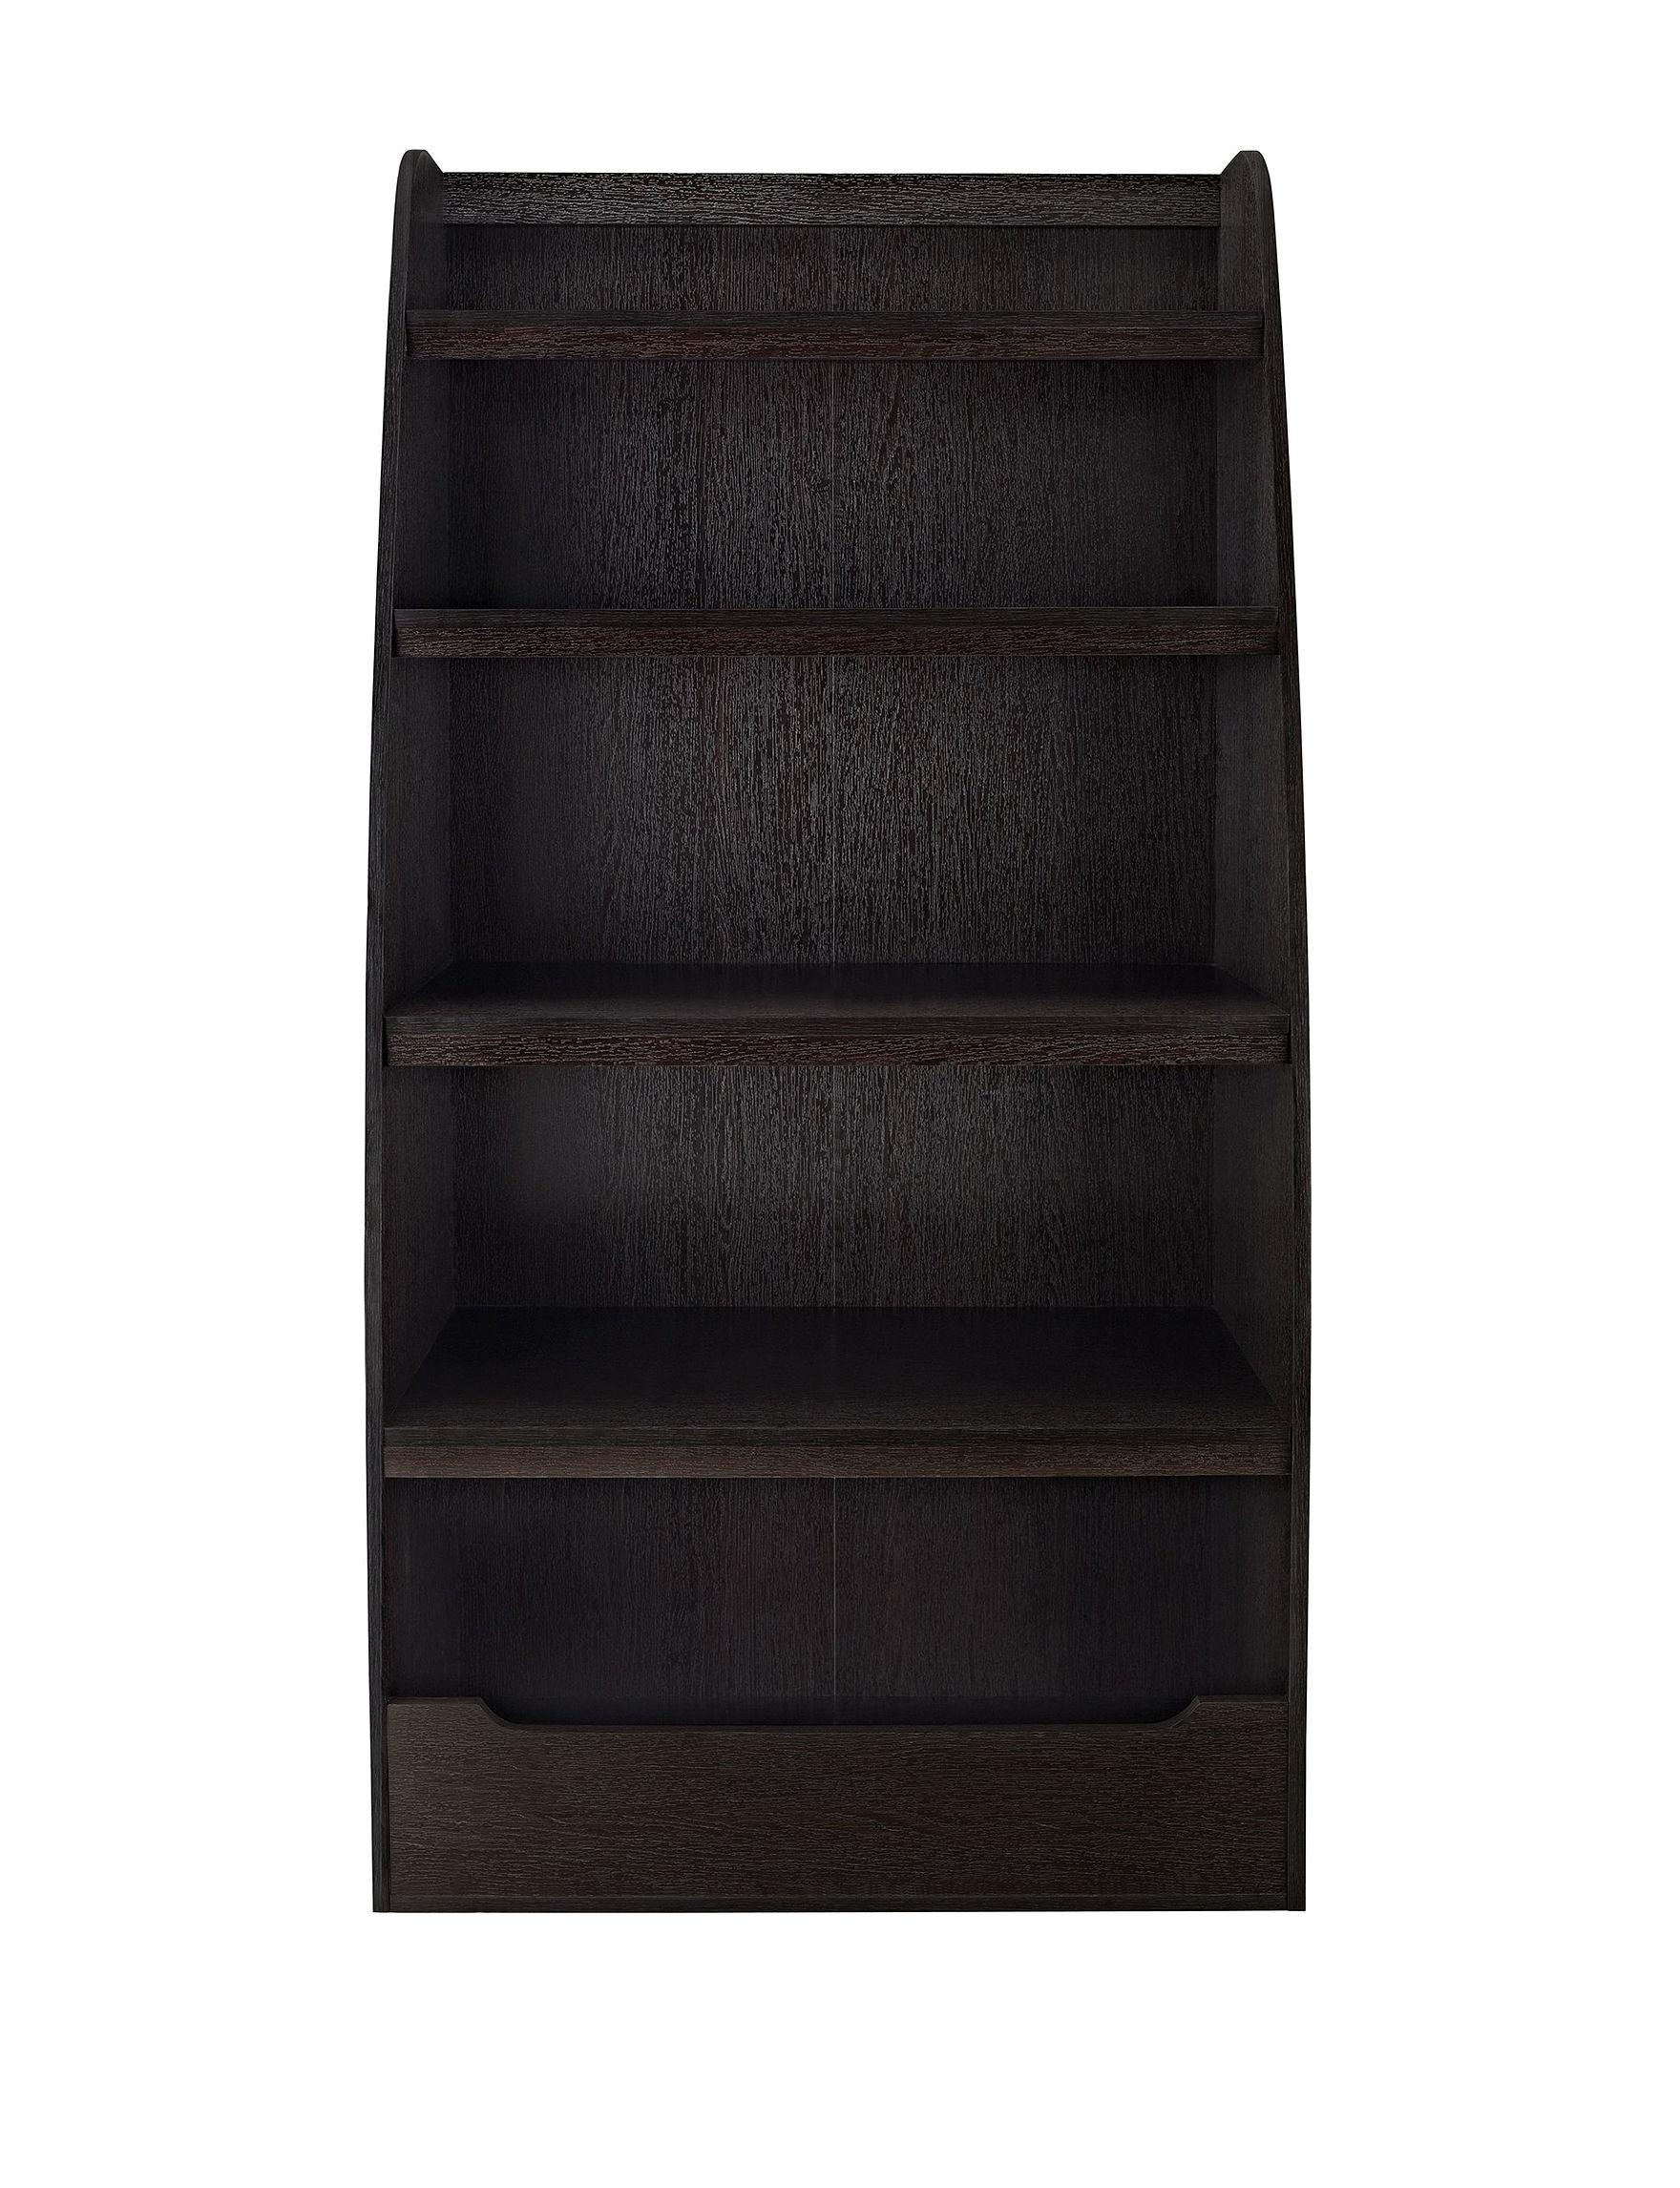 Altra Espresso Bookcases & Shelves Living Room Furniture